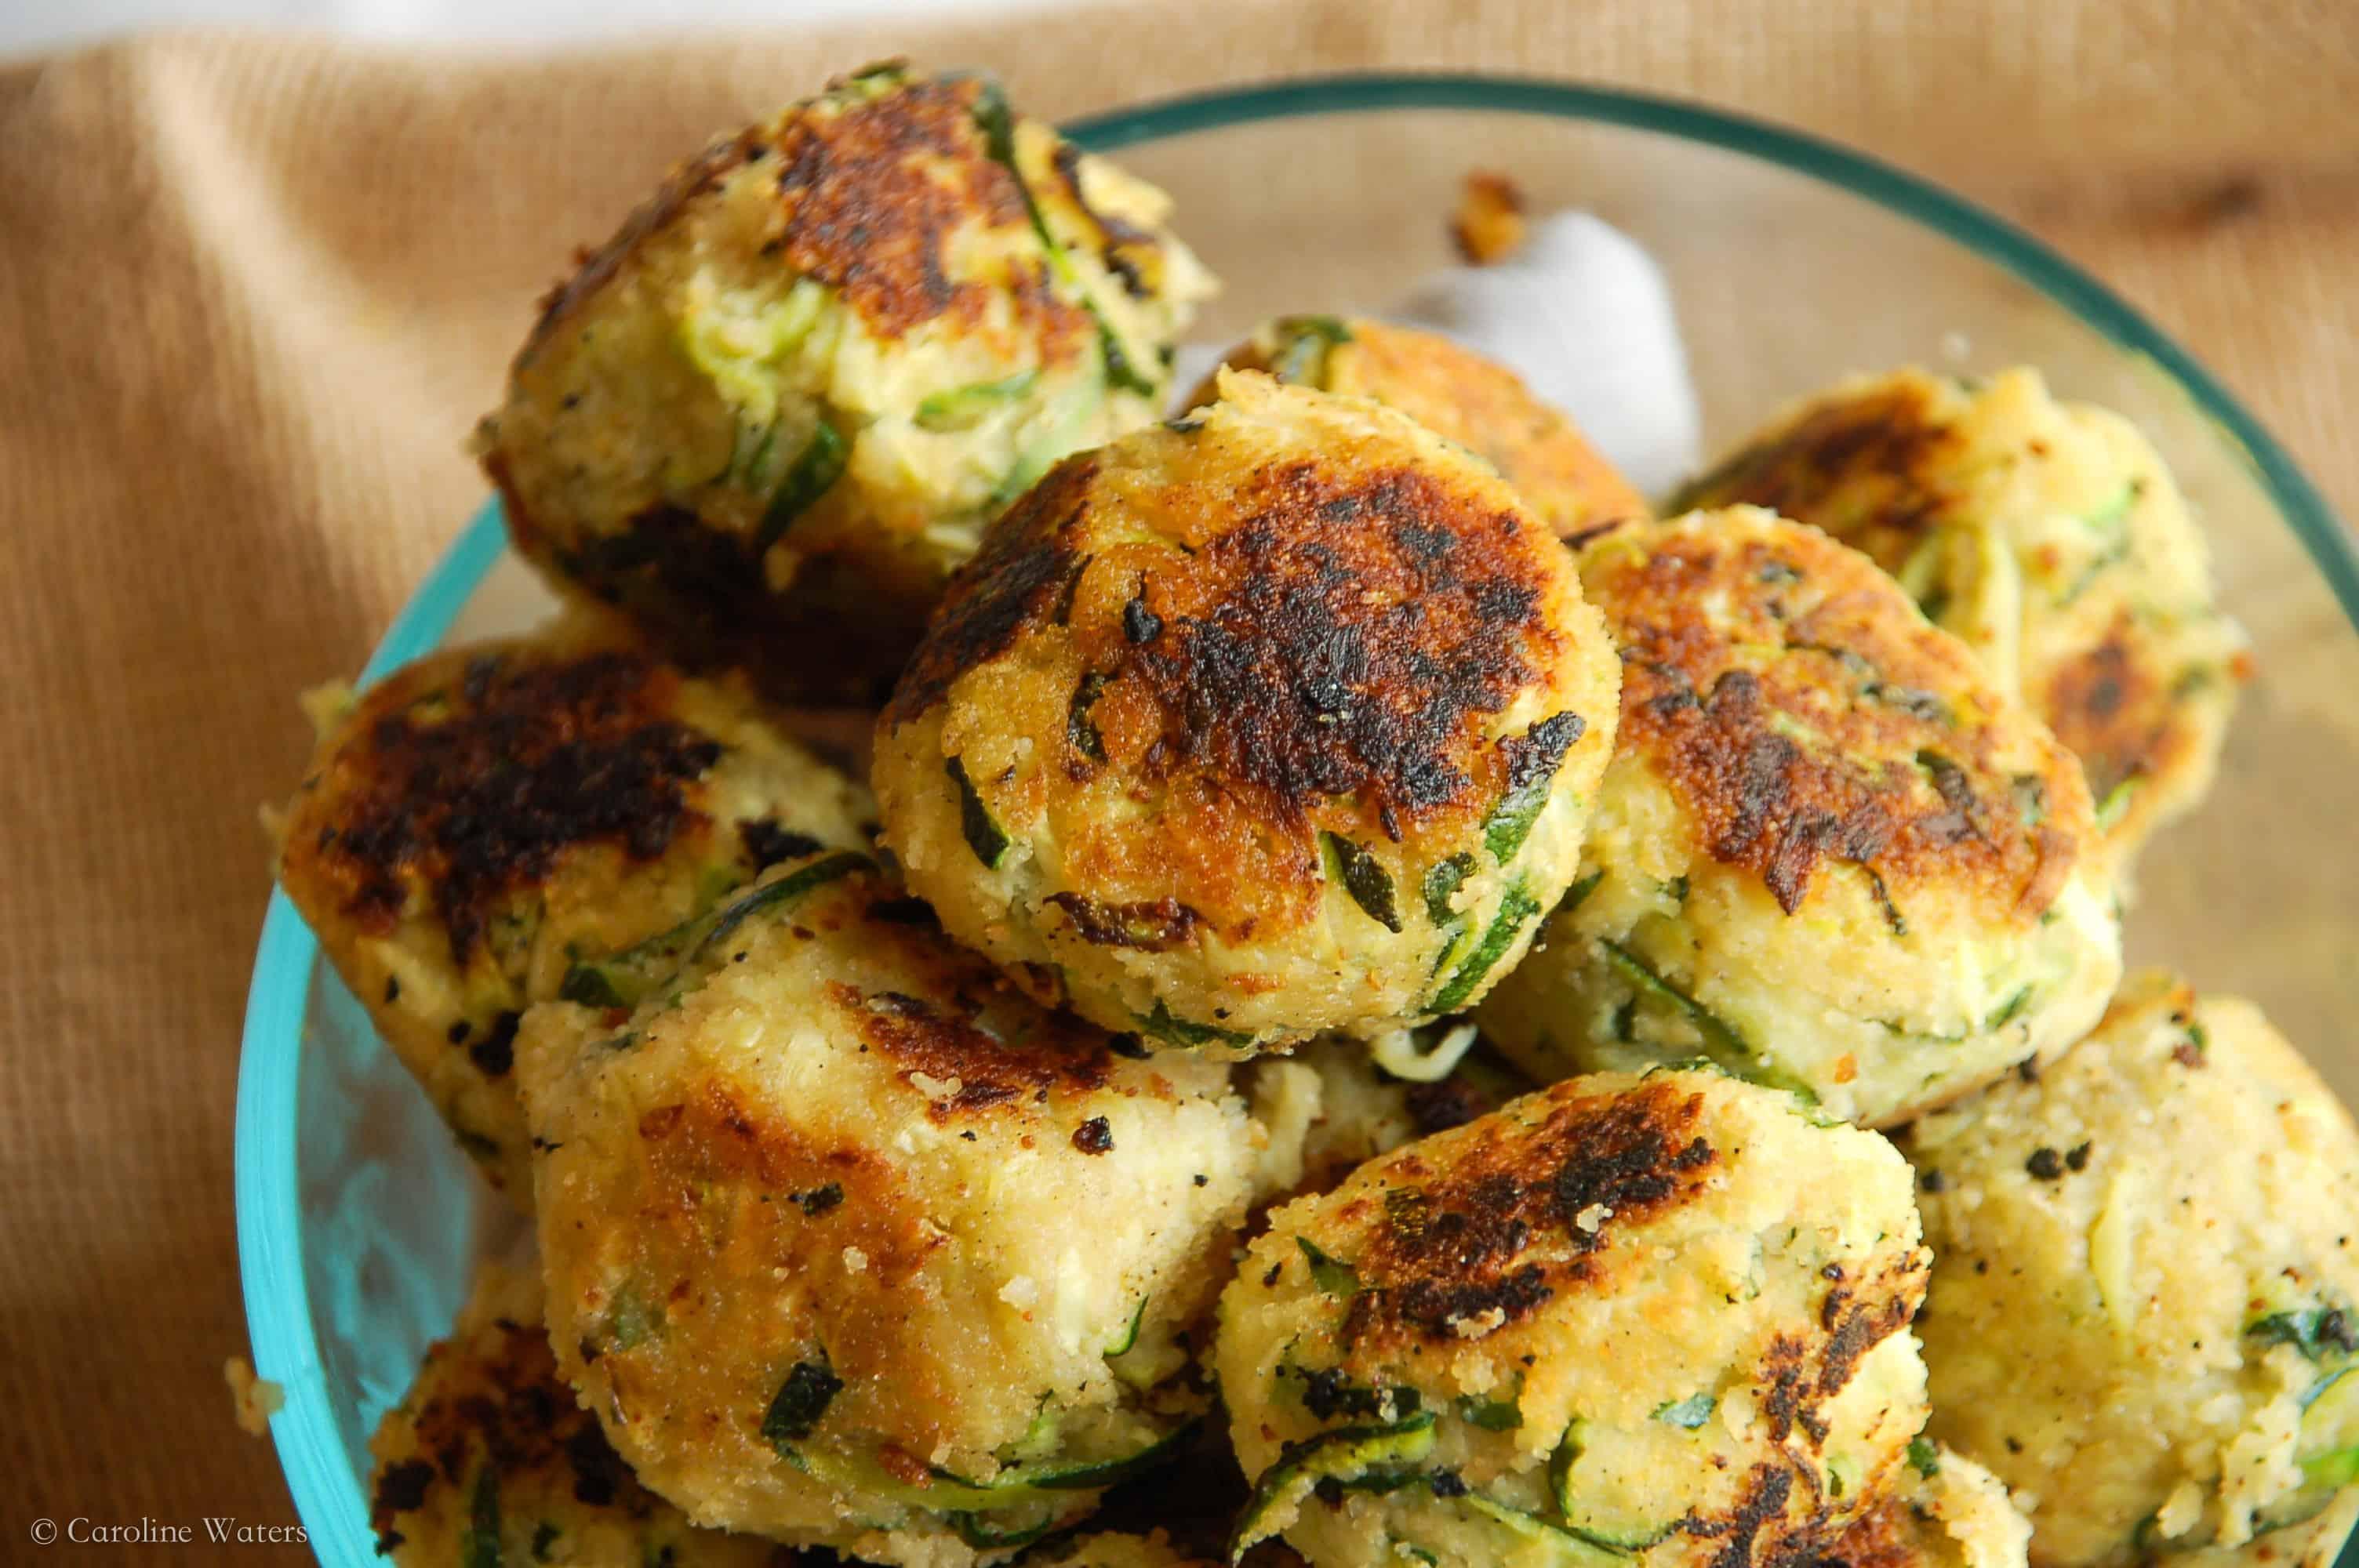 Tasty Zucchini Meatballs (veg)